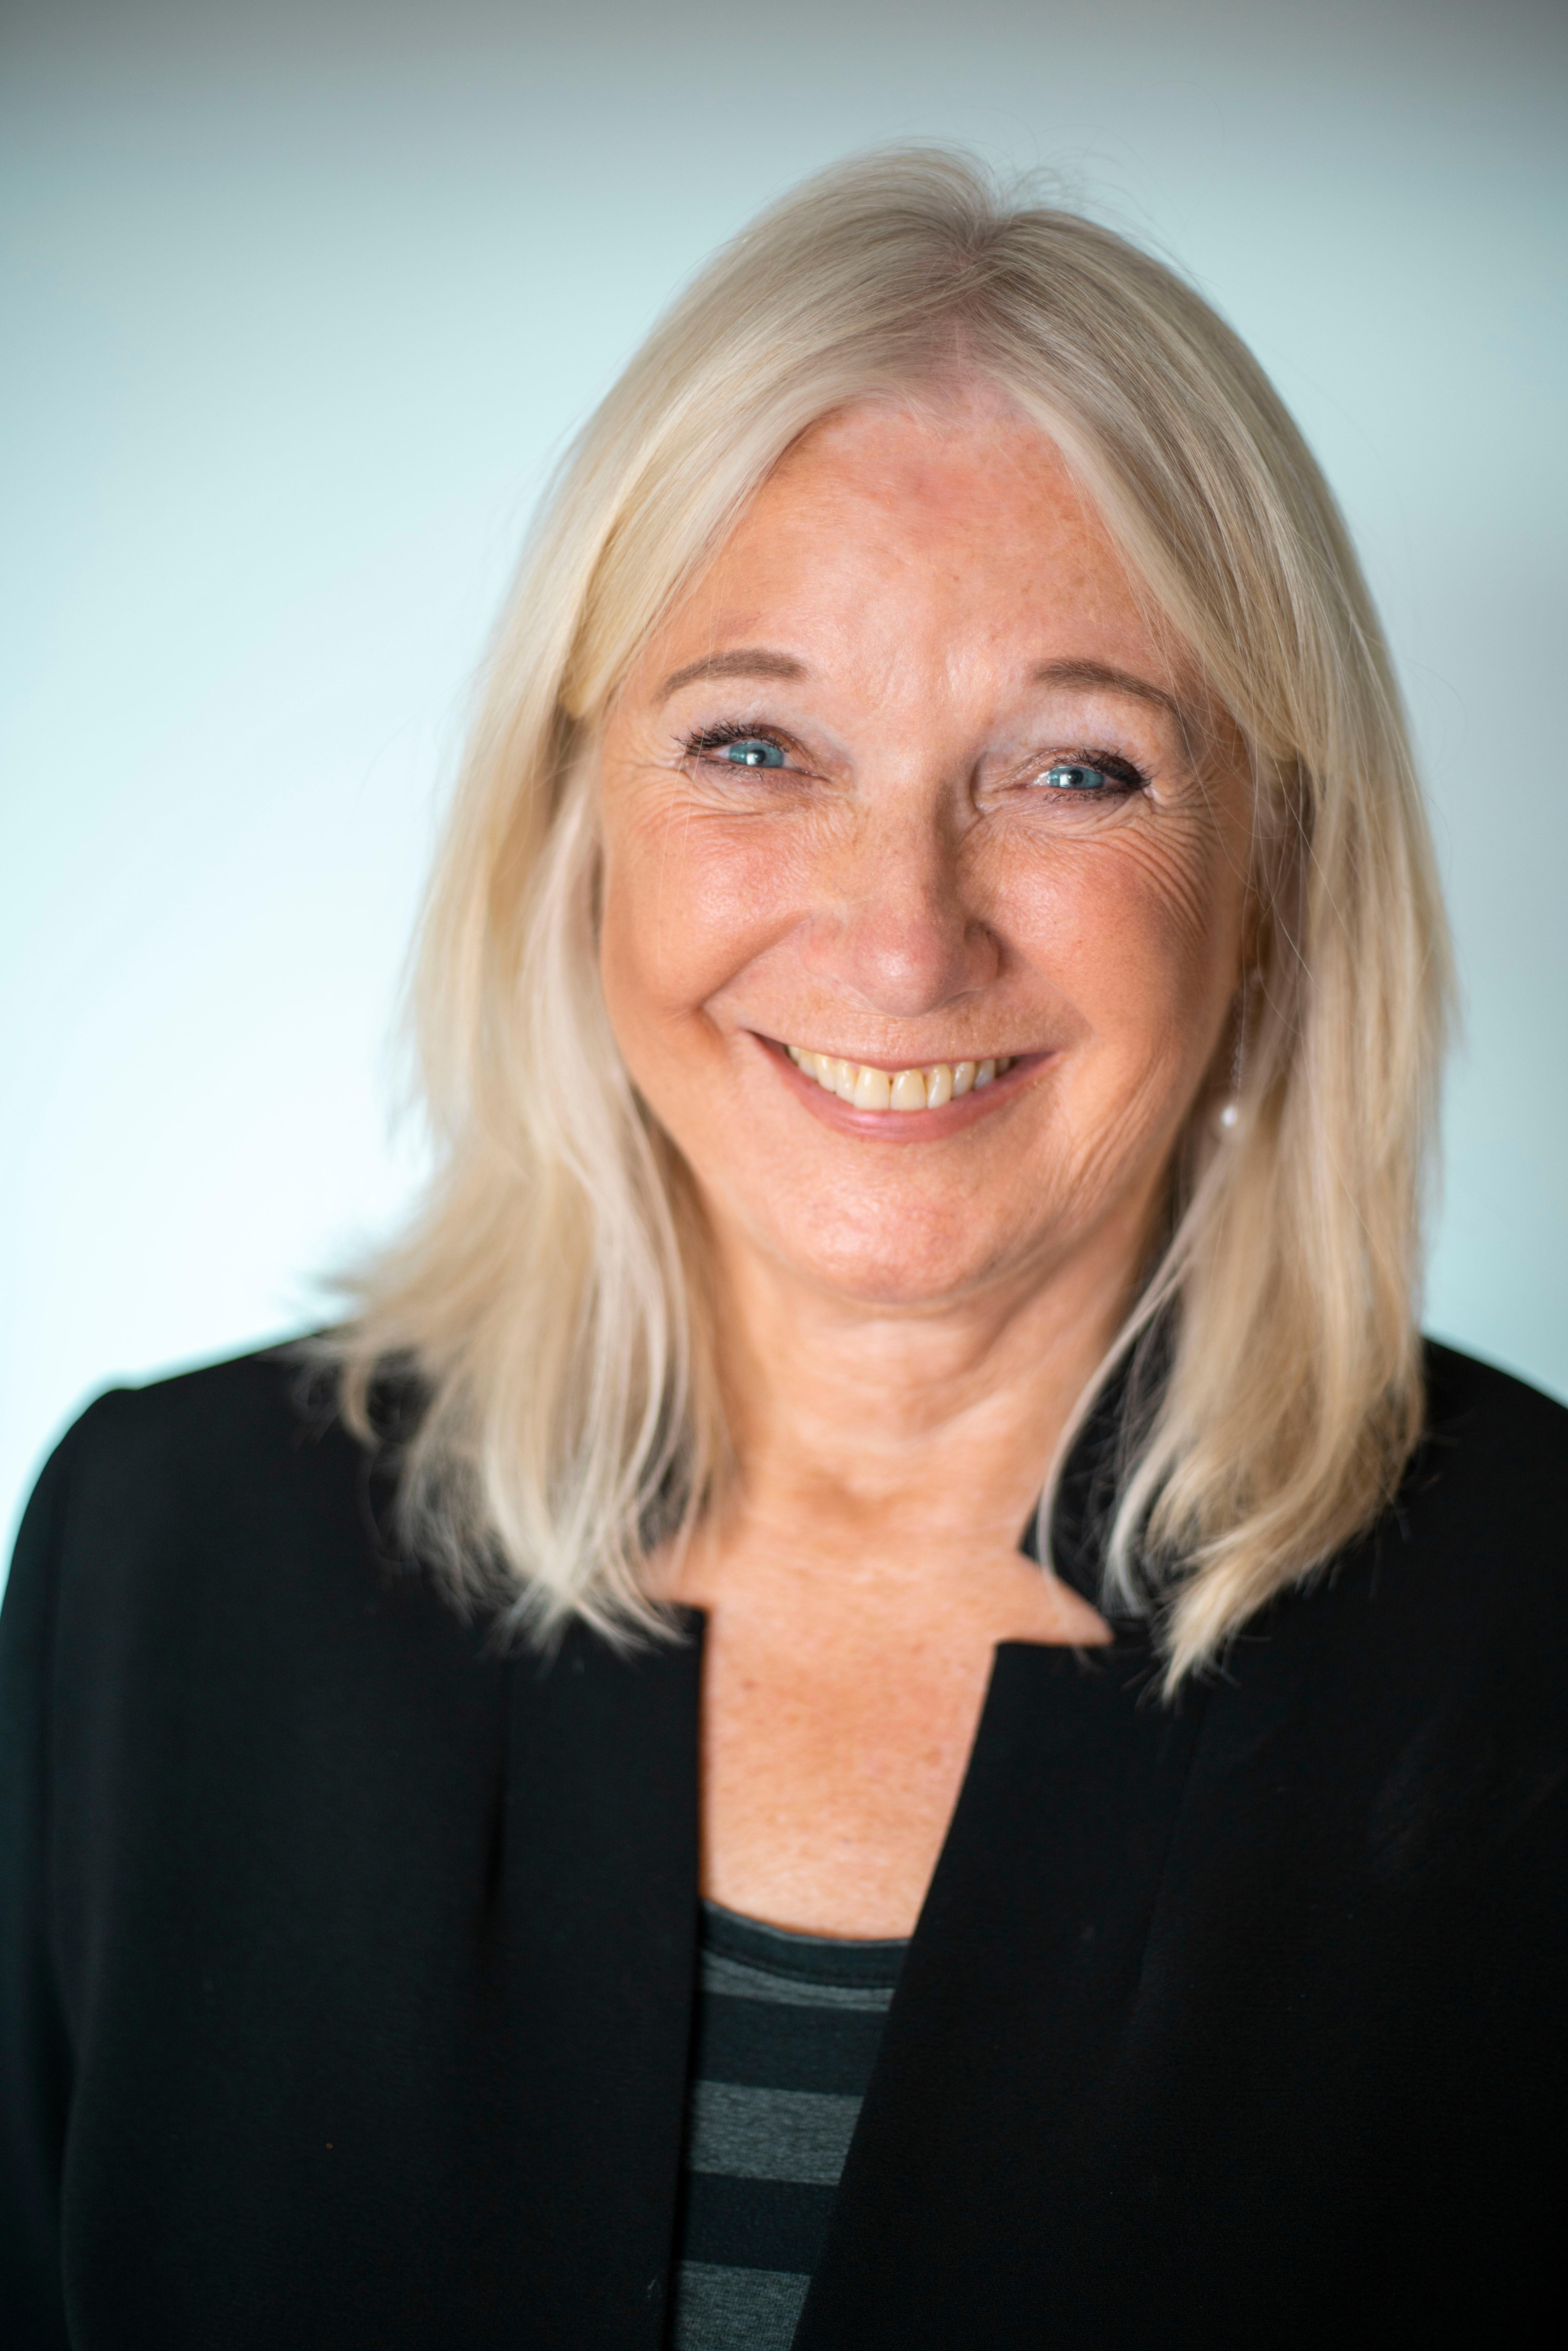 Cornelia Elbrecht